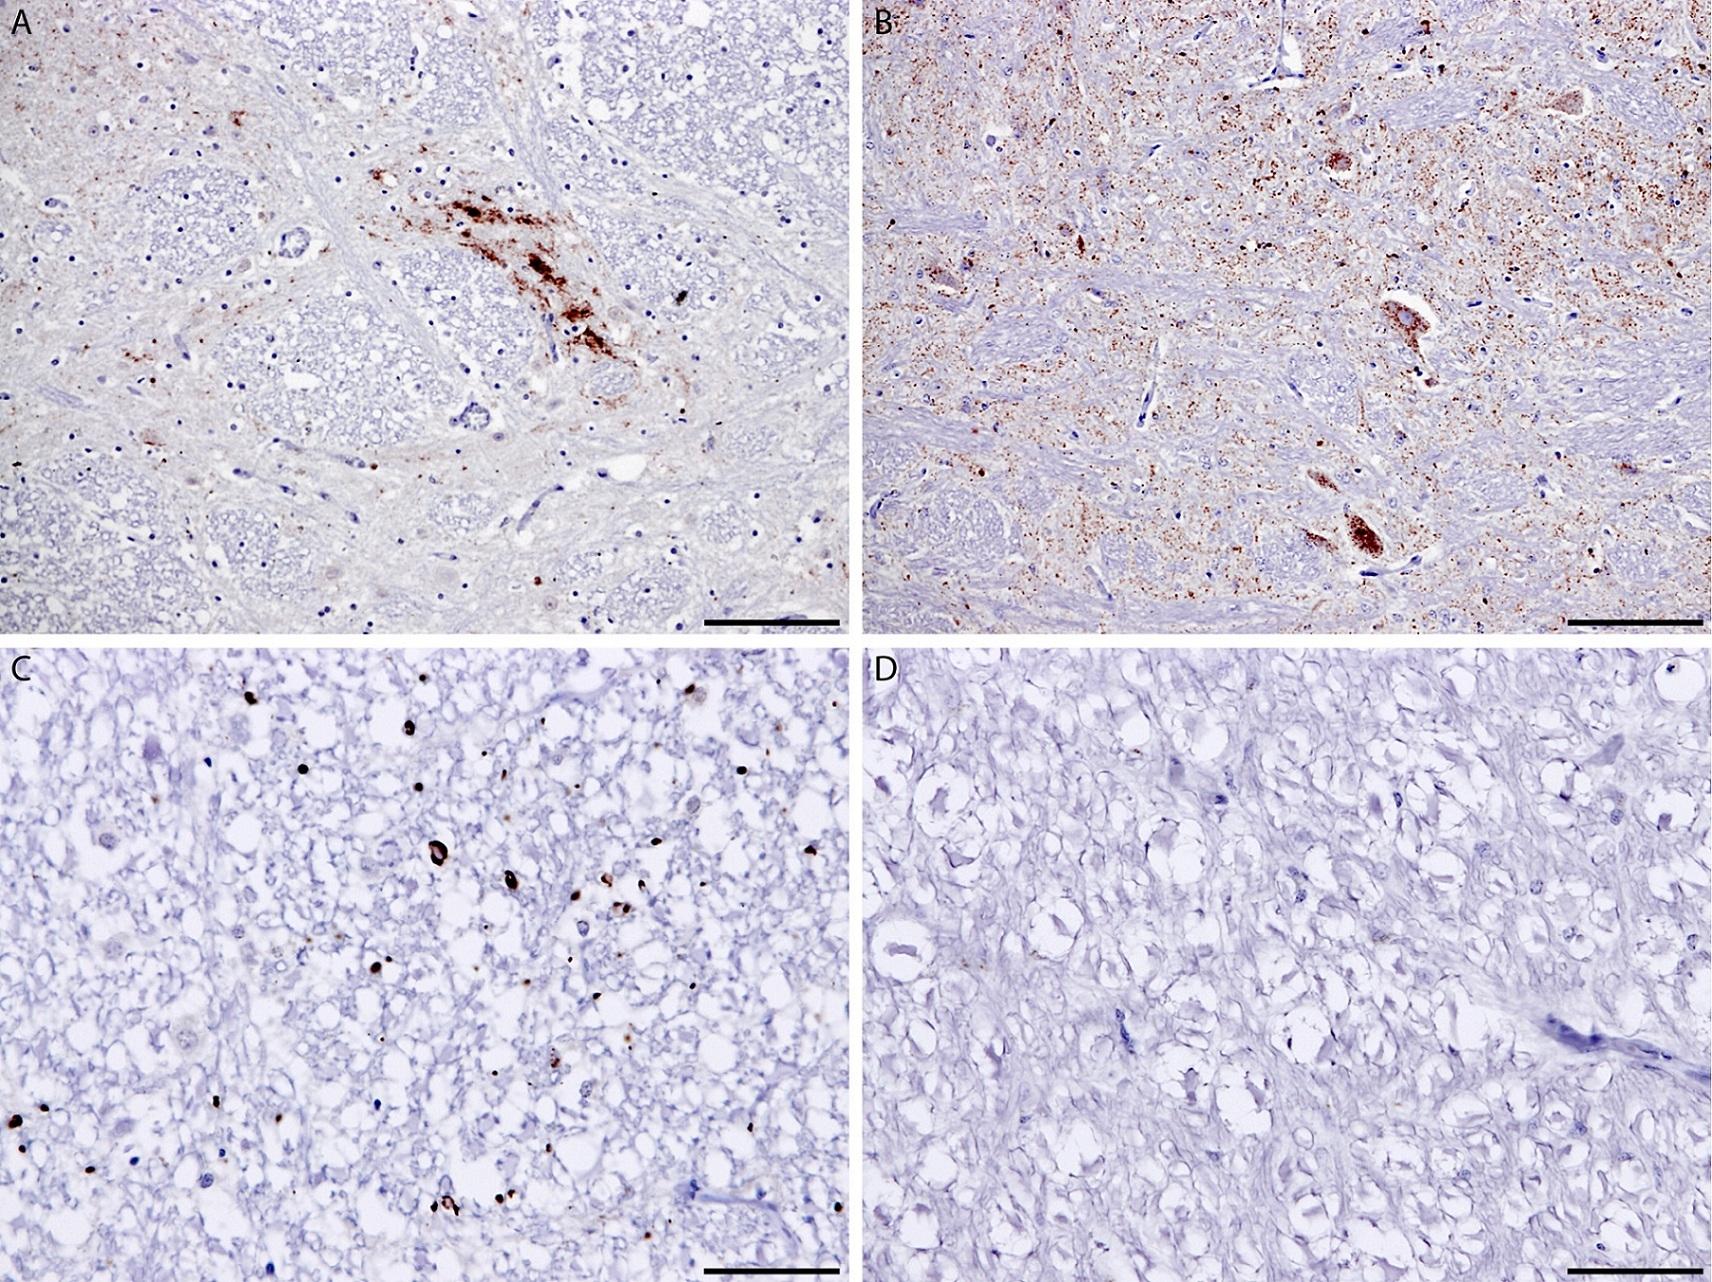 CD230 (Prpsc) Antibody | 2G11 gallery image 1